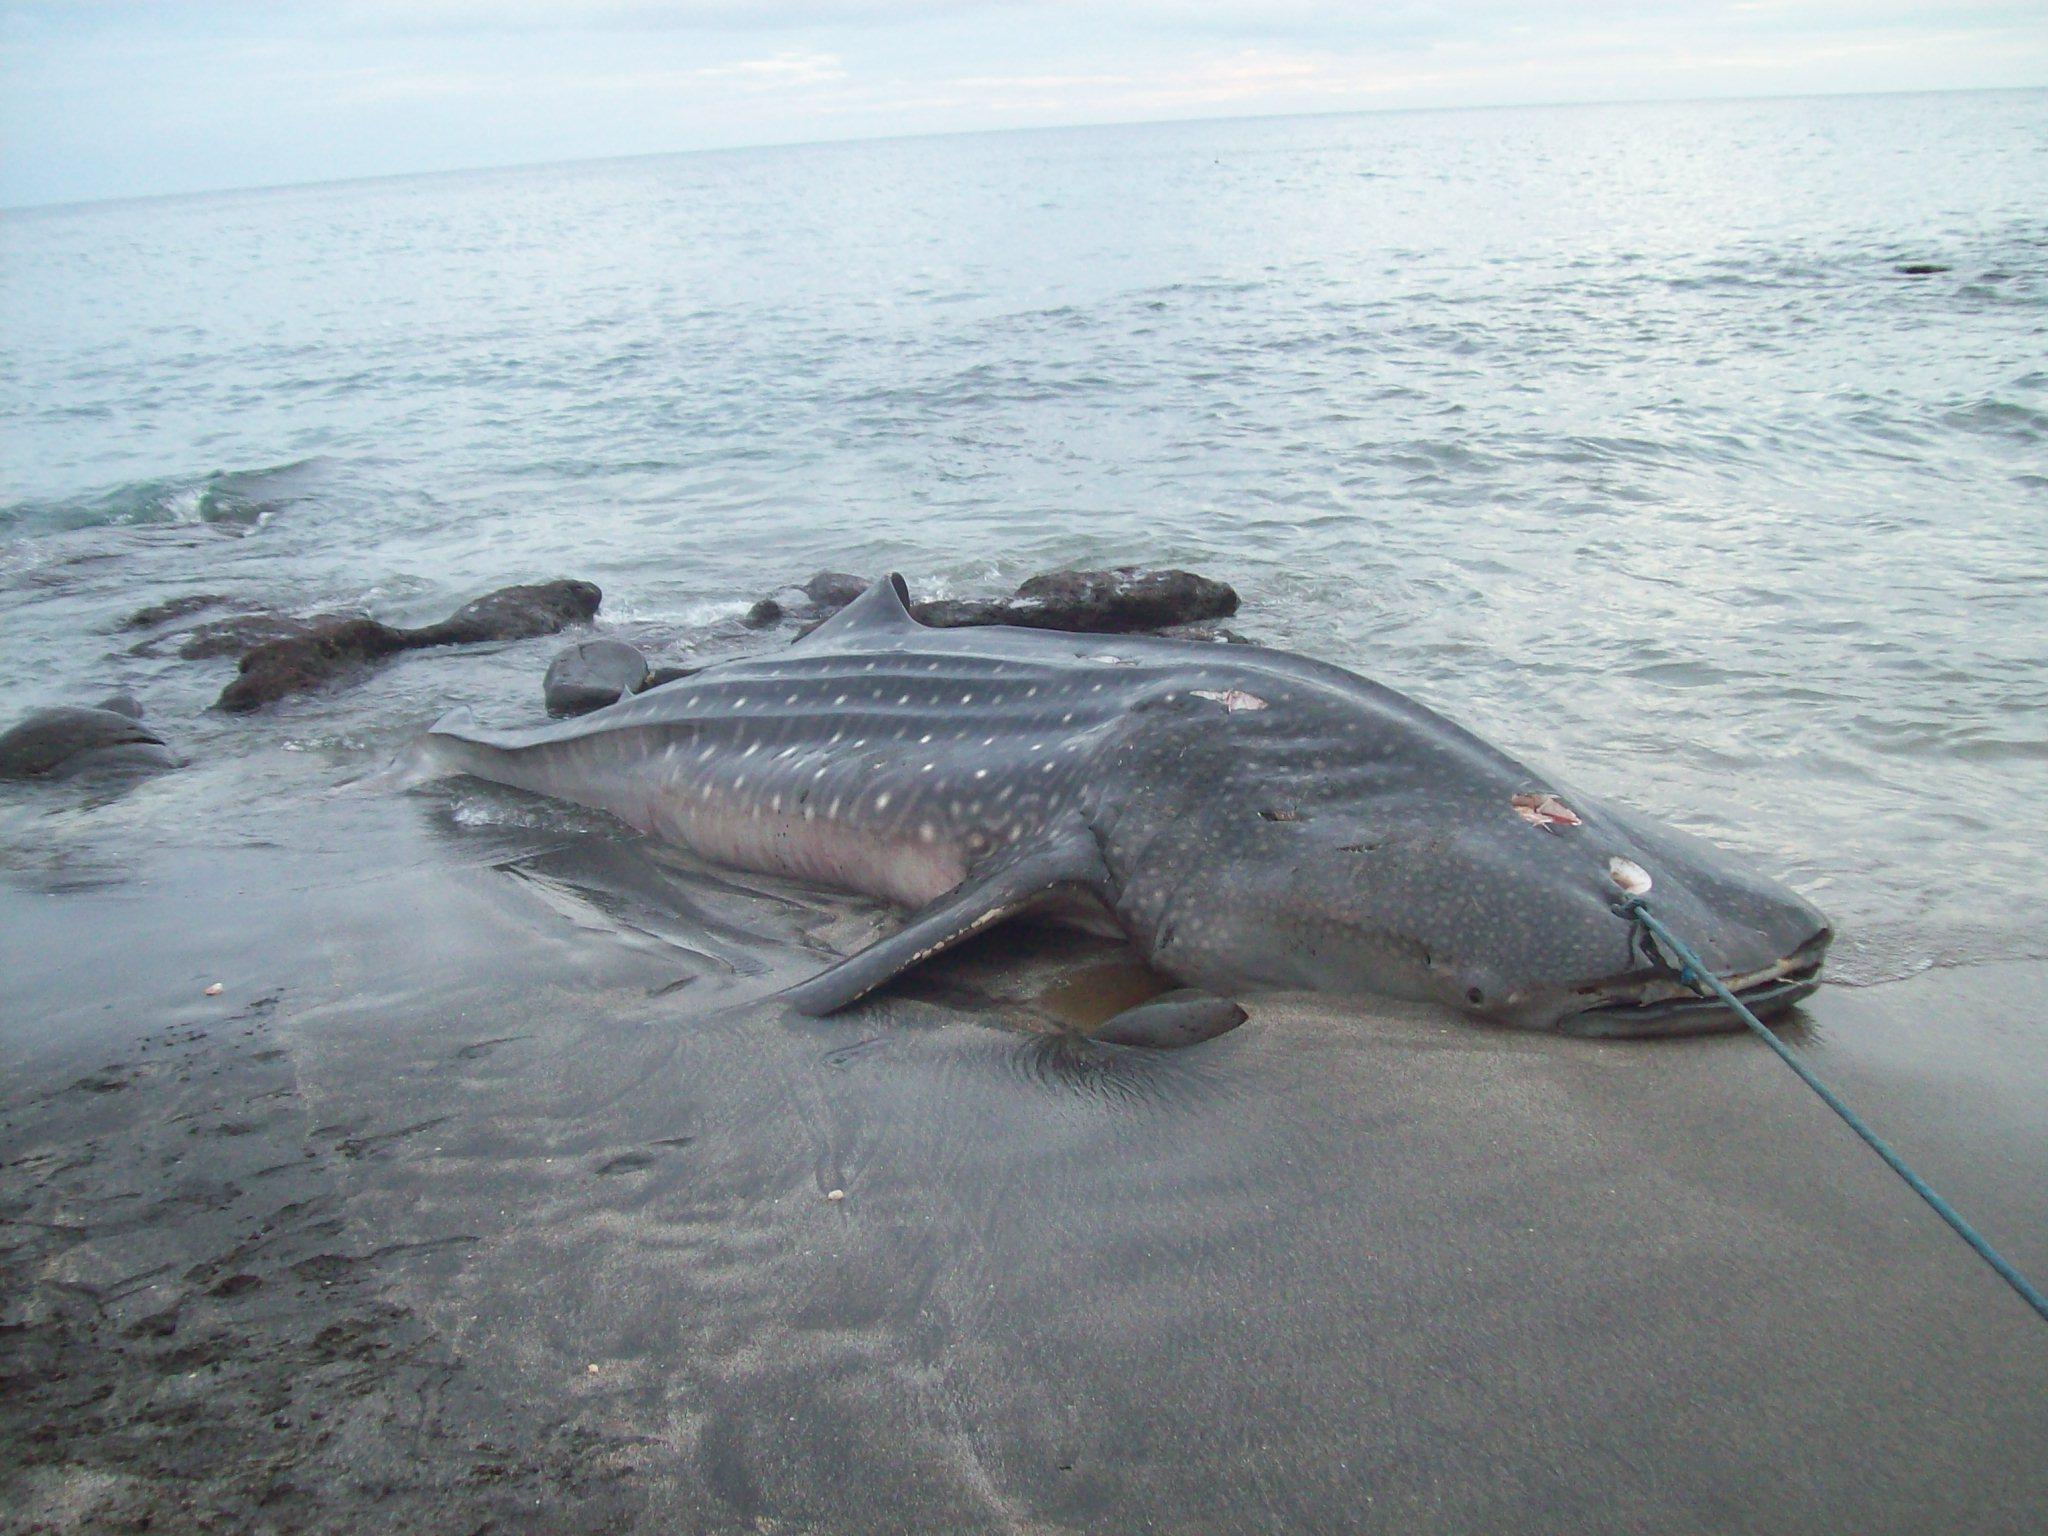 A harpooned whale shark in Lamalera, Indonesia.